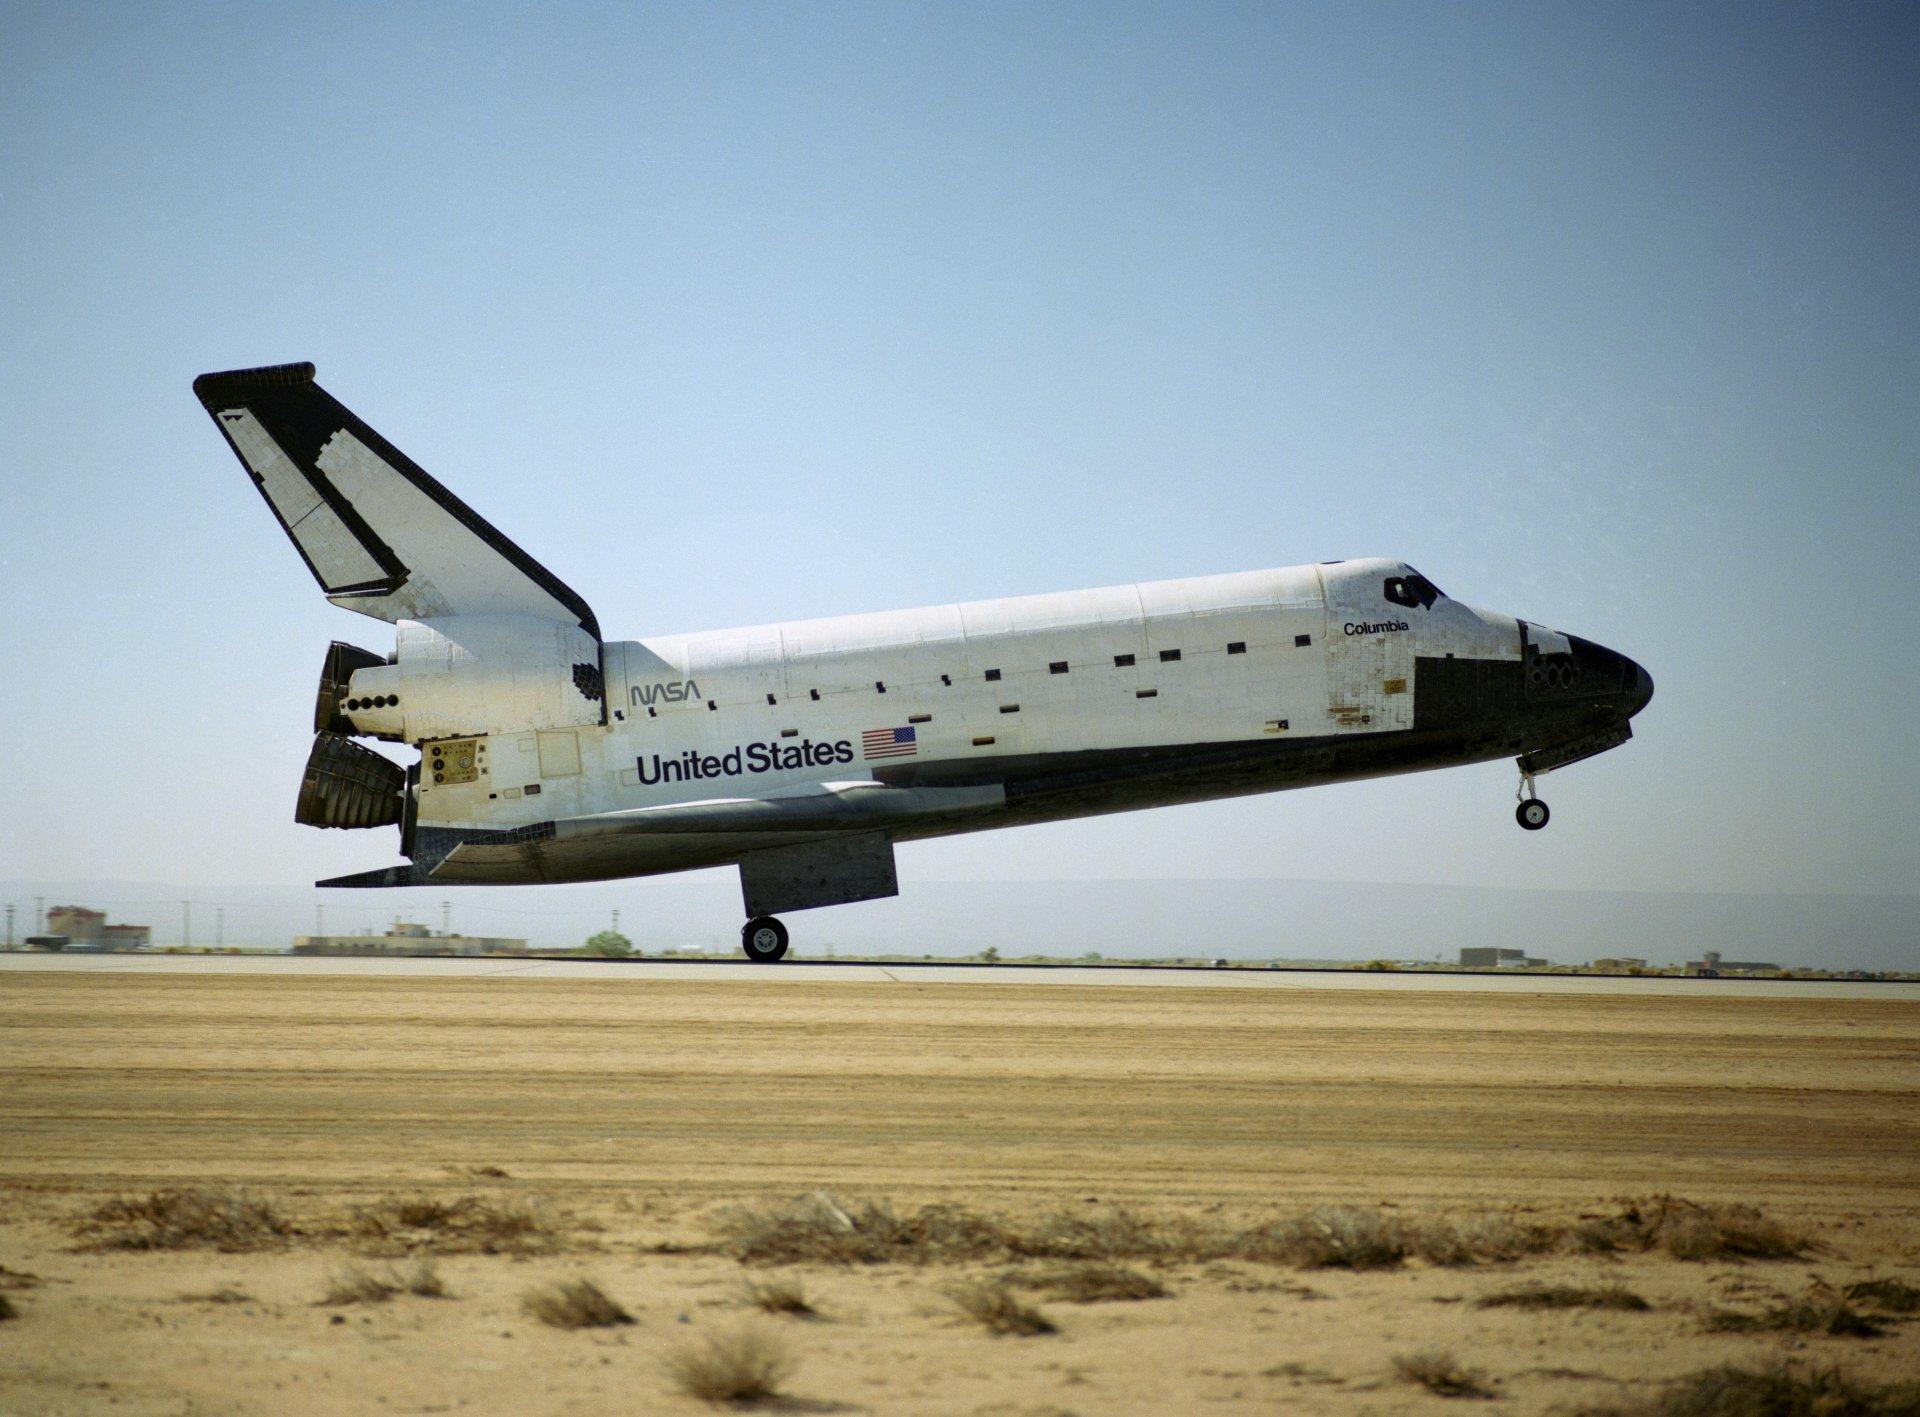 space shuttle columbia wallpaper - photo #4